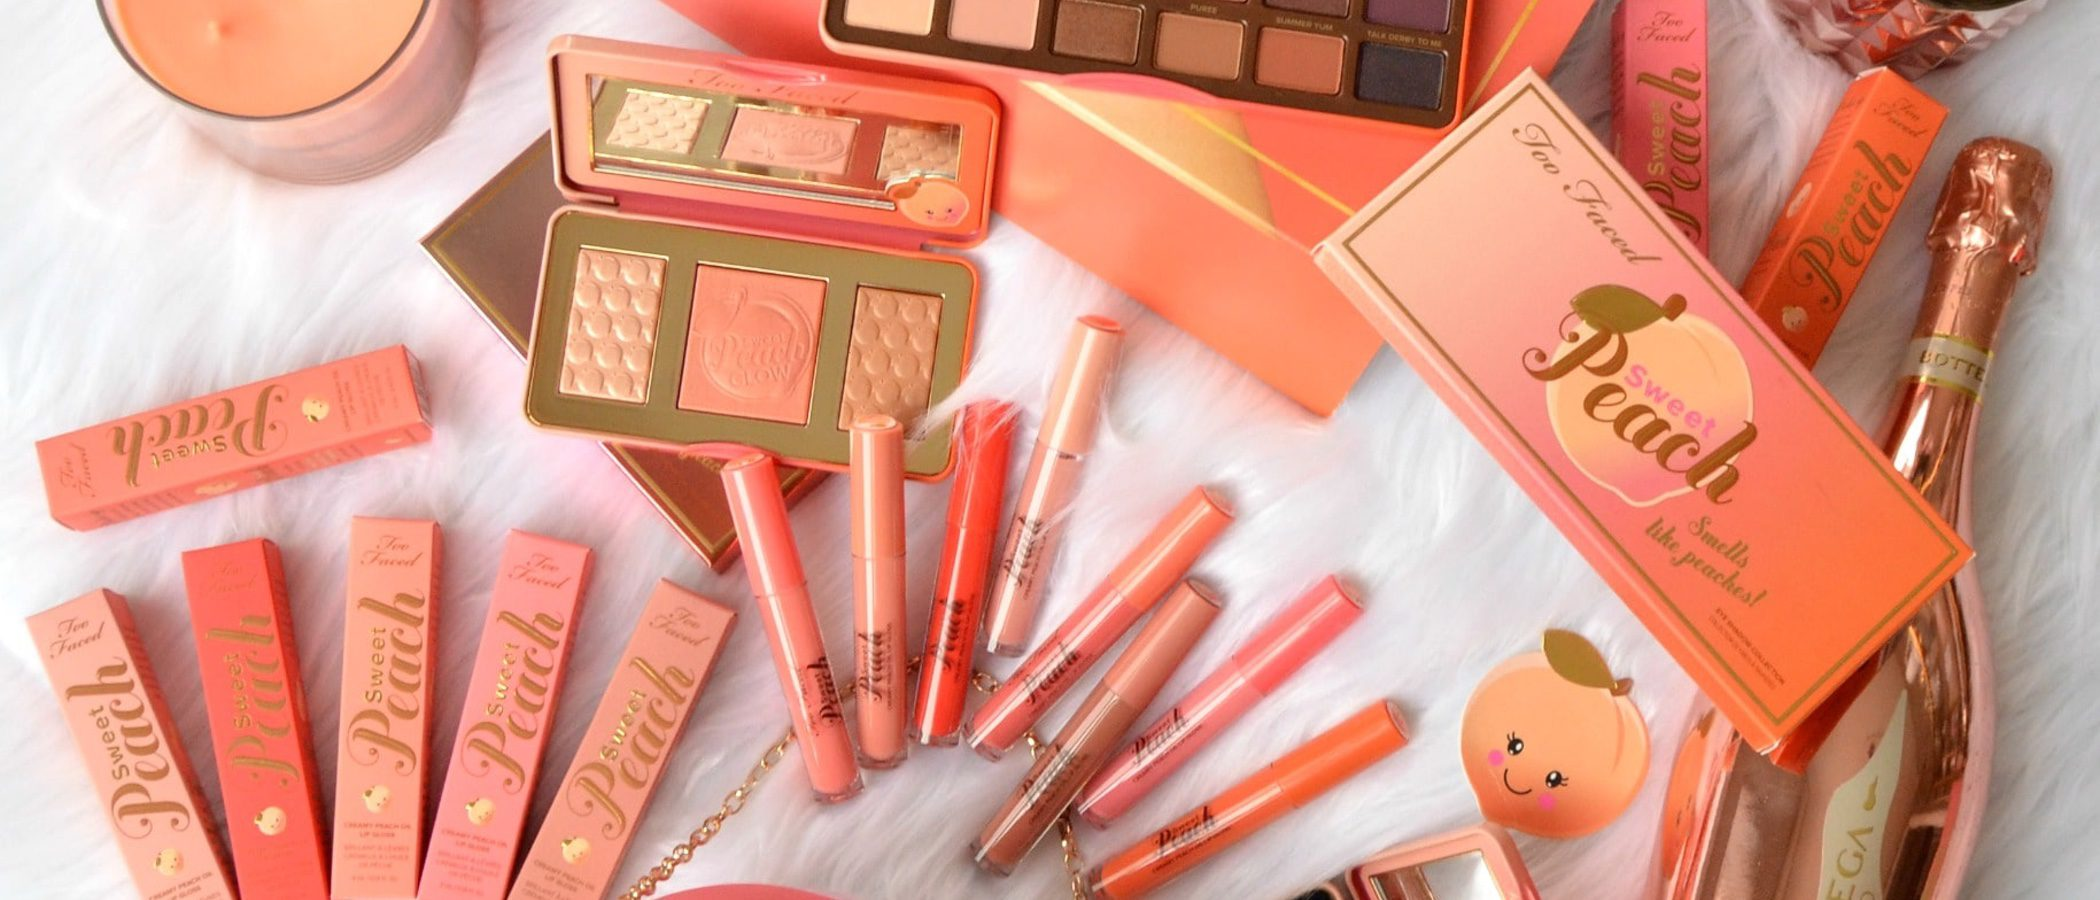 Too Faced lanza su próxima colección de maquillaje para otoño: 'Peaches and Cream'